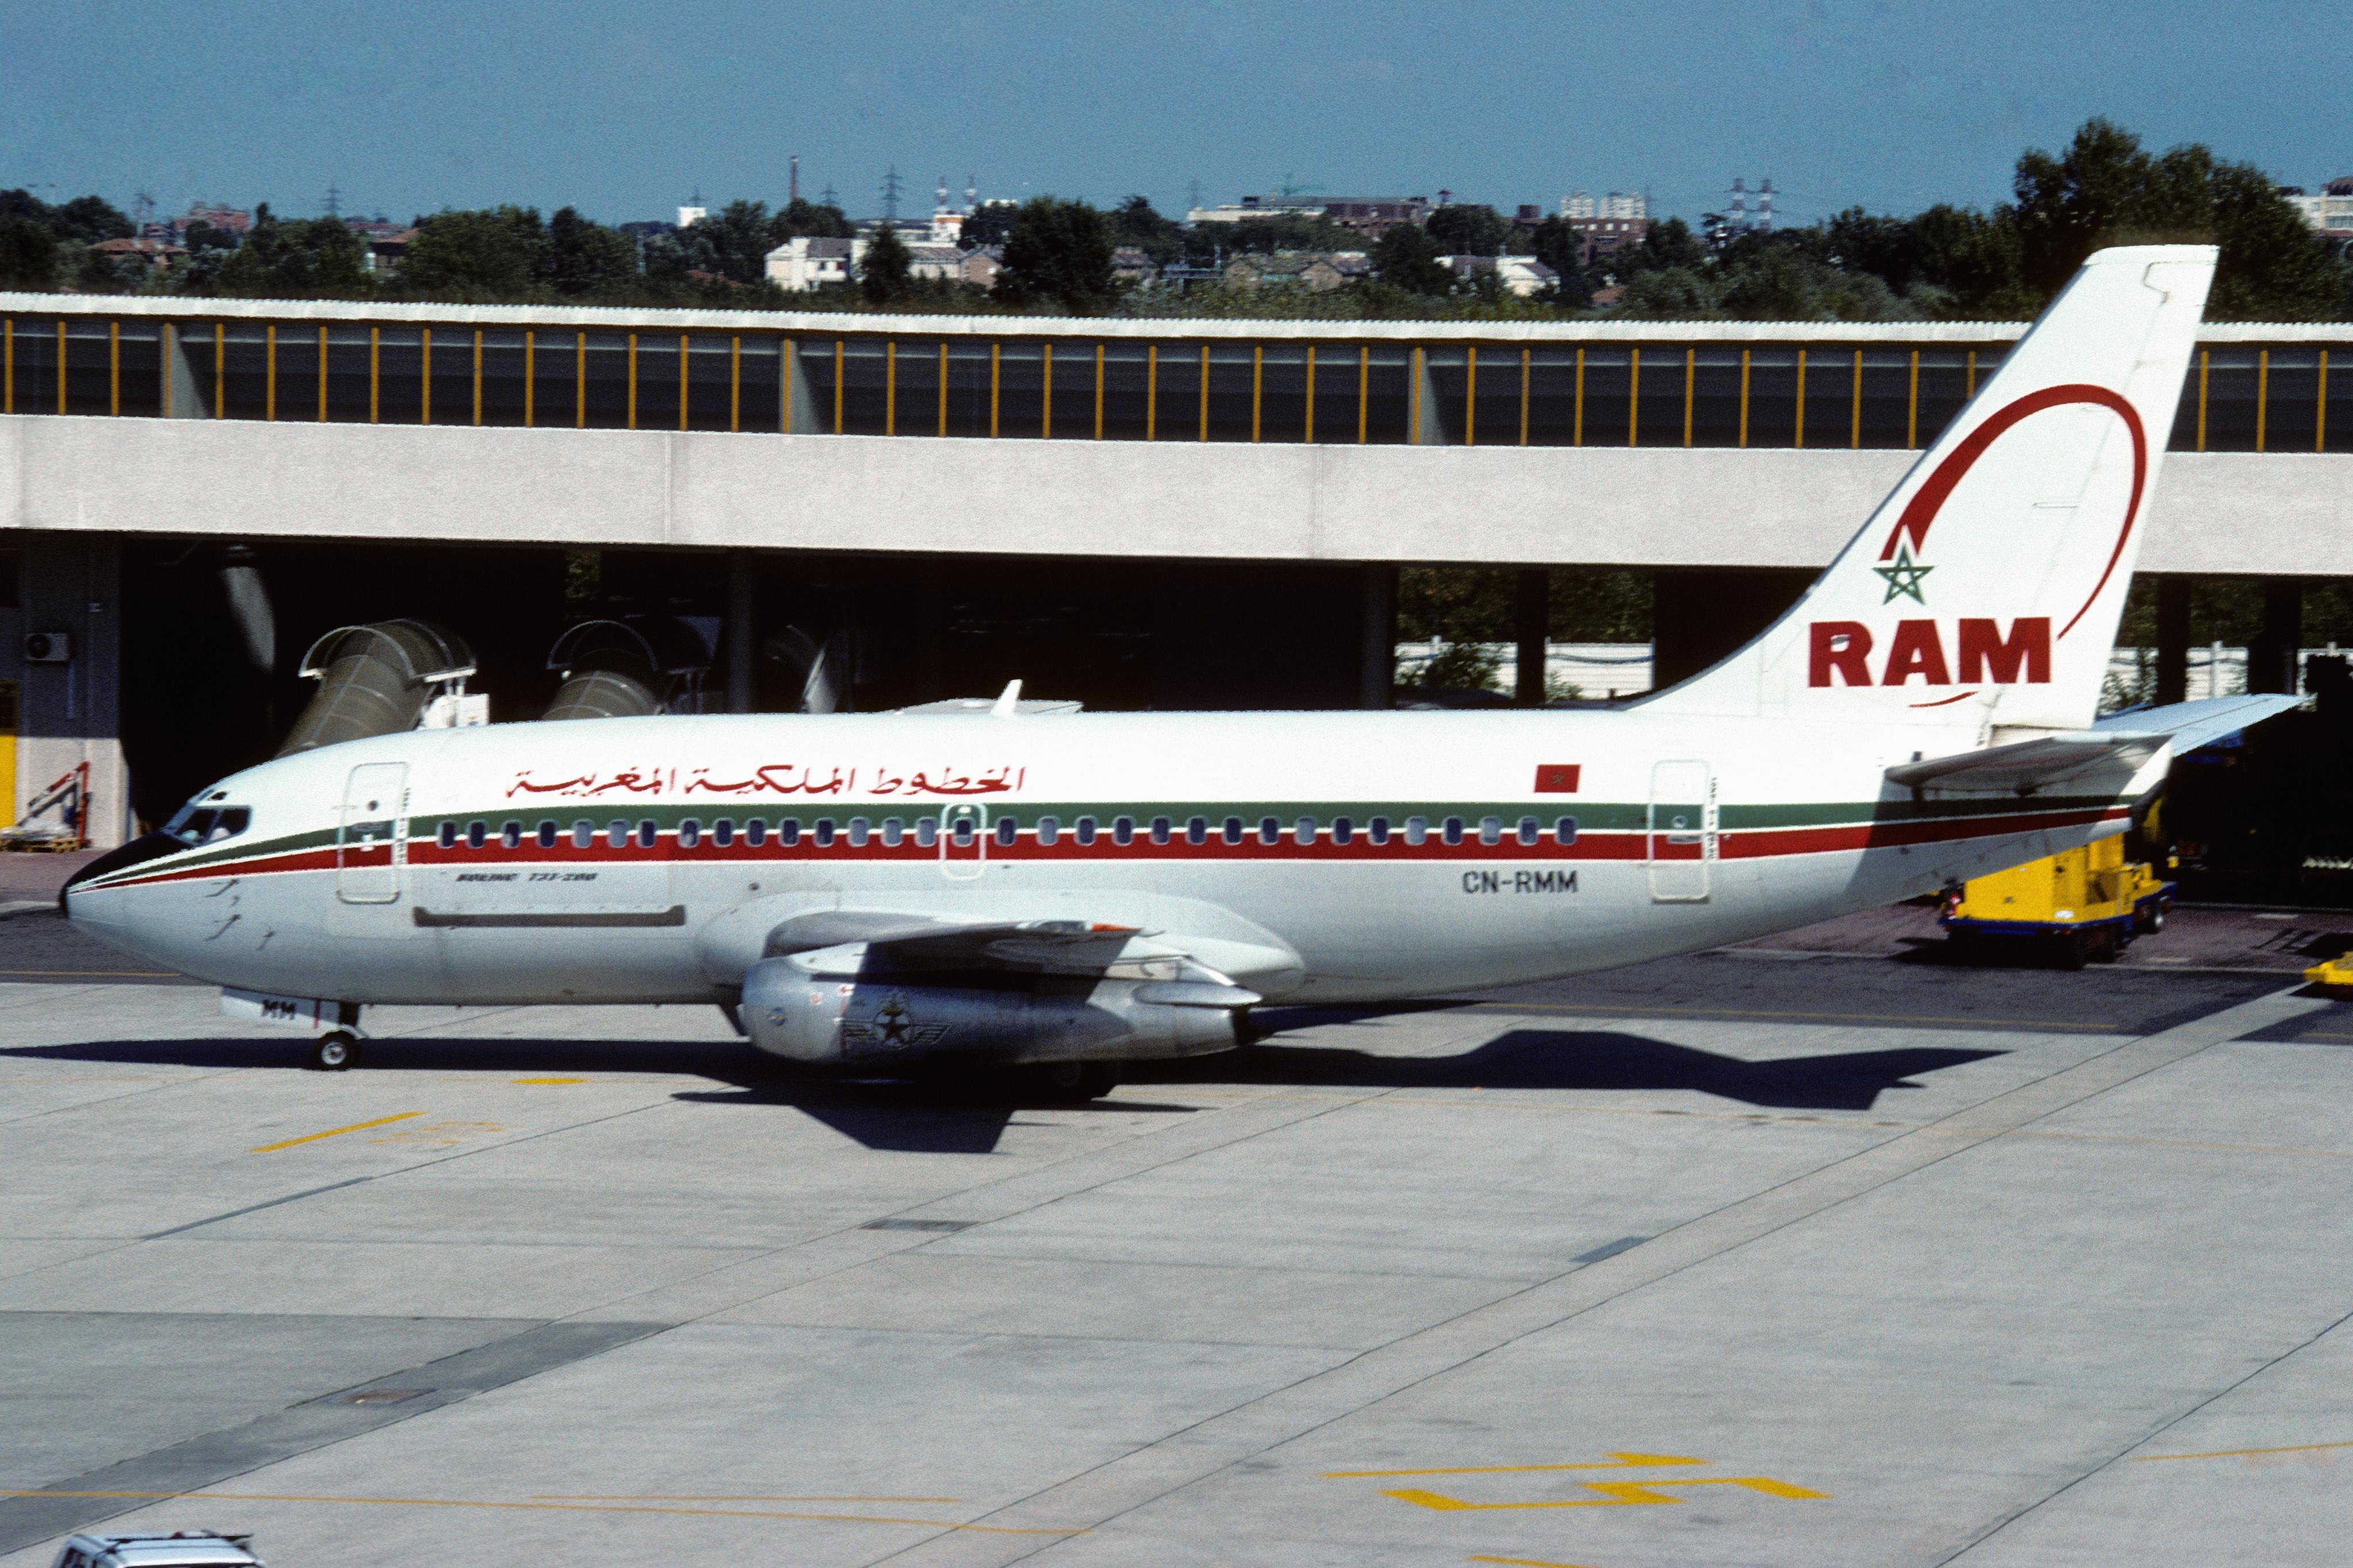 Anciens avions de la RAM - Page 2 Royal_Air_Maroc_Boeing_737-2B6C_%28CN-RMM_951_23049%29_%288011350546%29